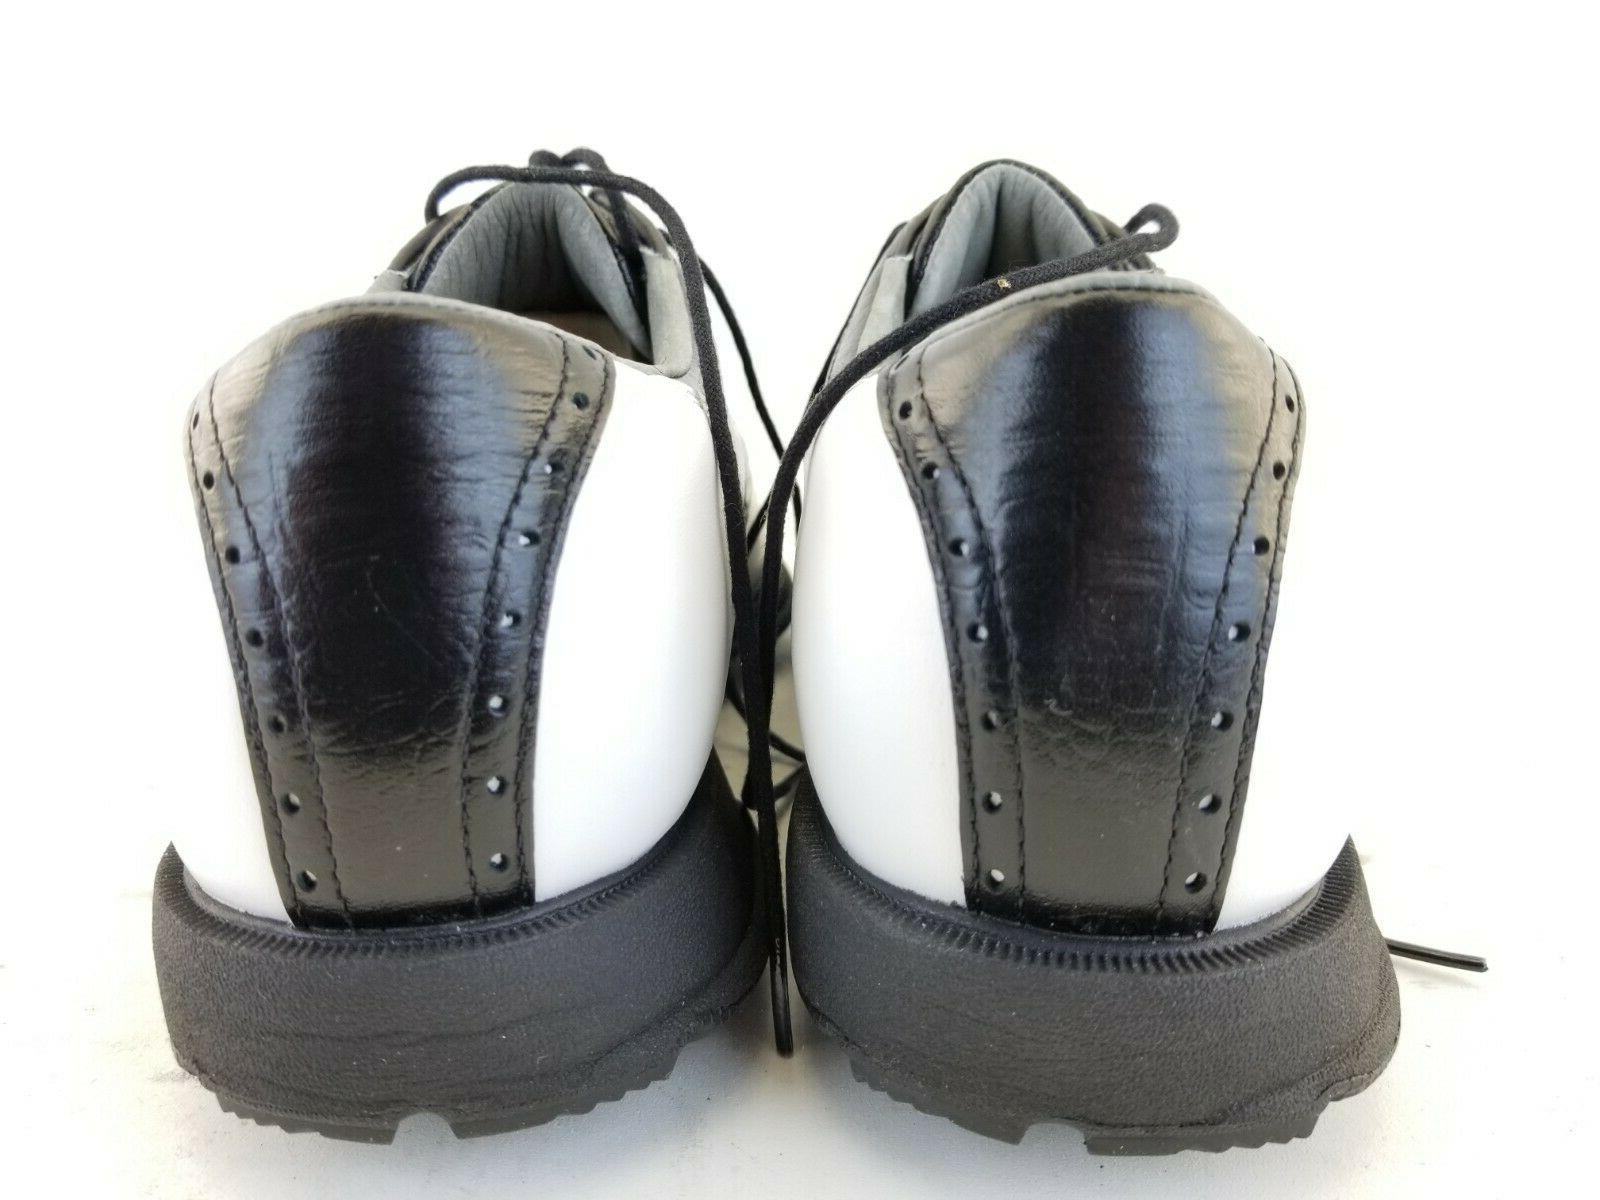 Etonic Mens 400 White Golf Shoes Cleats Size